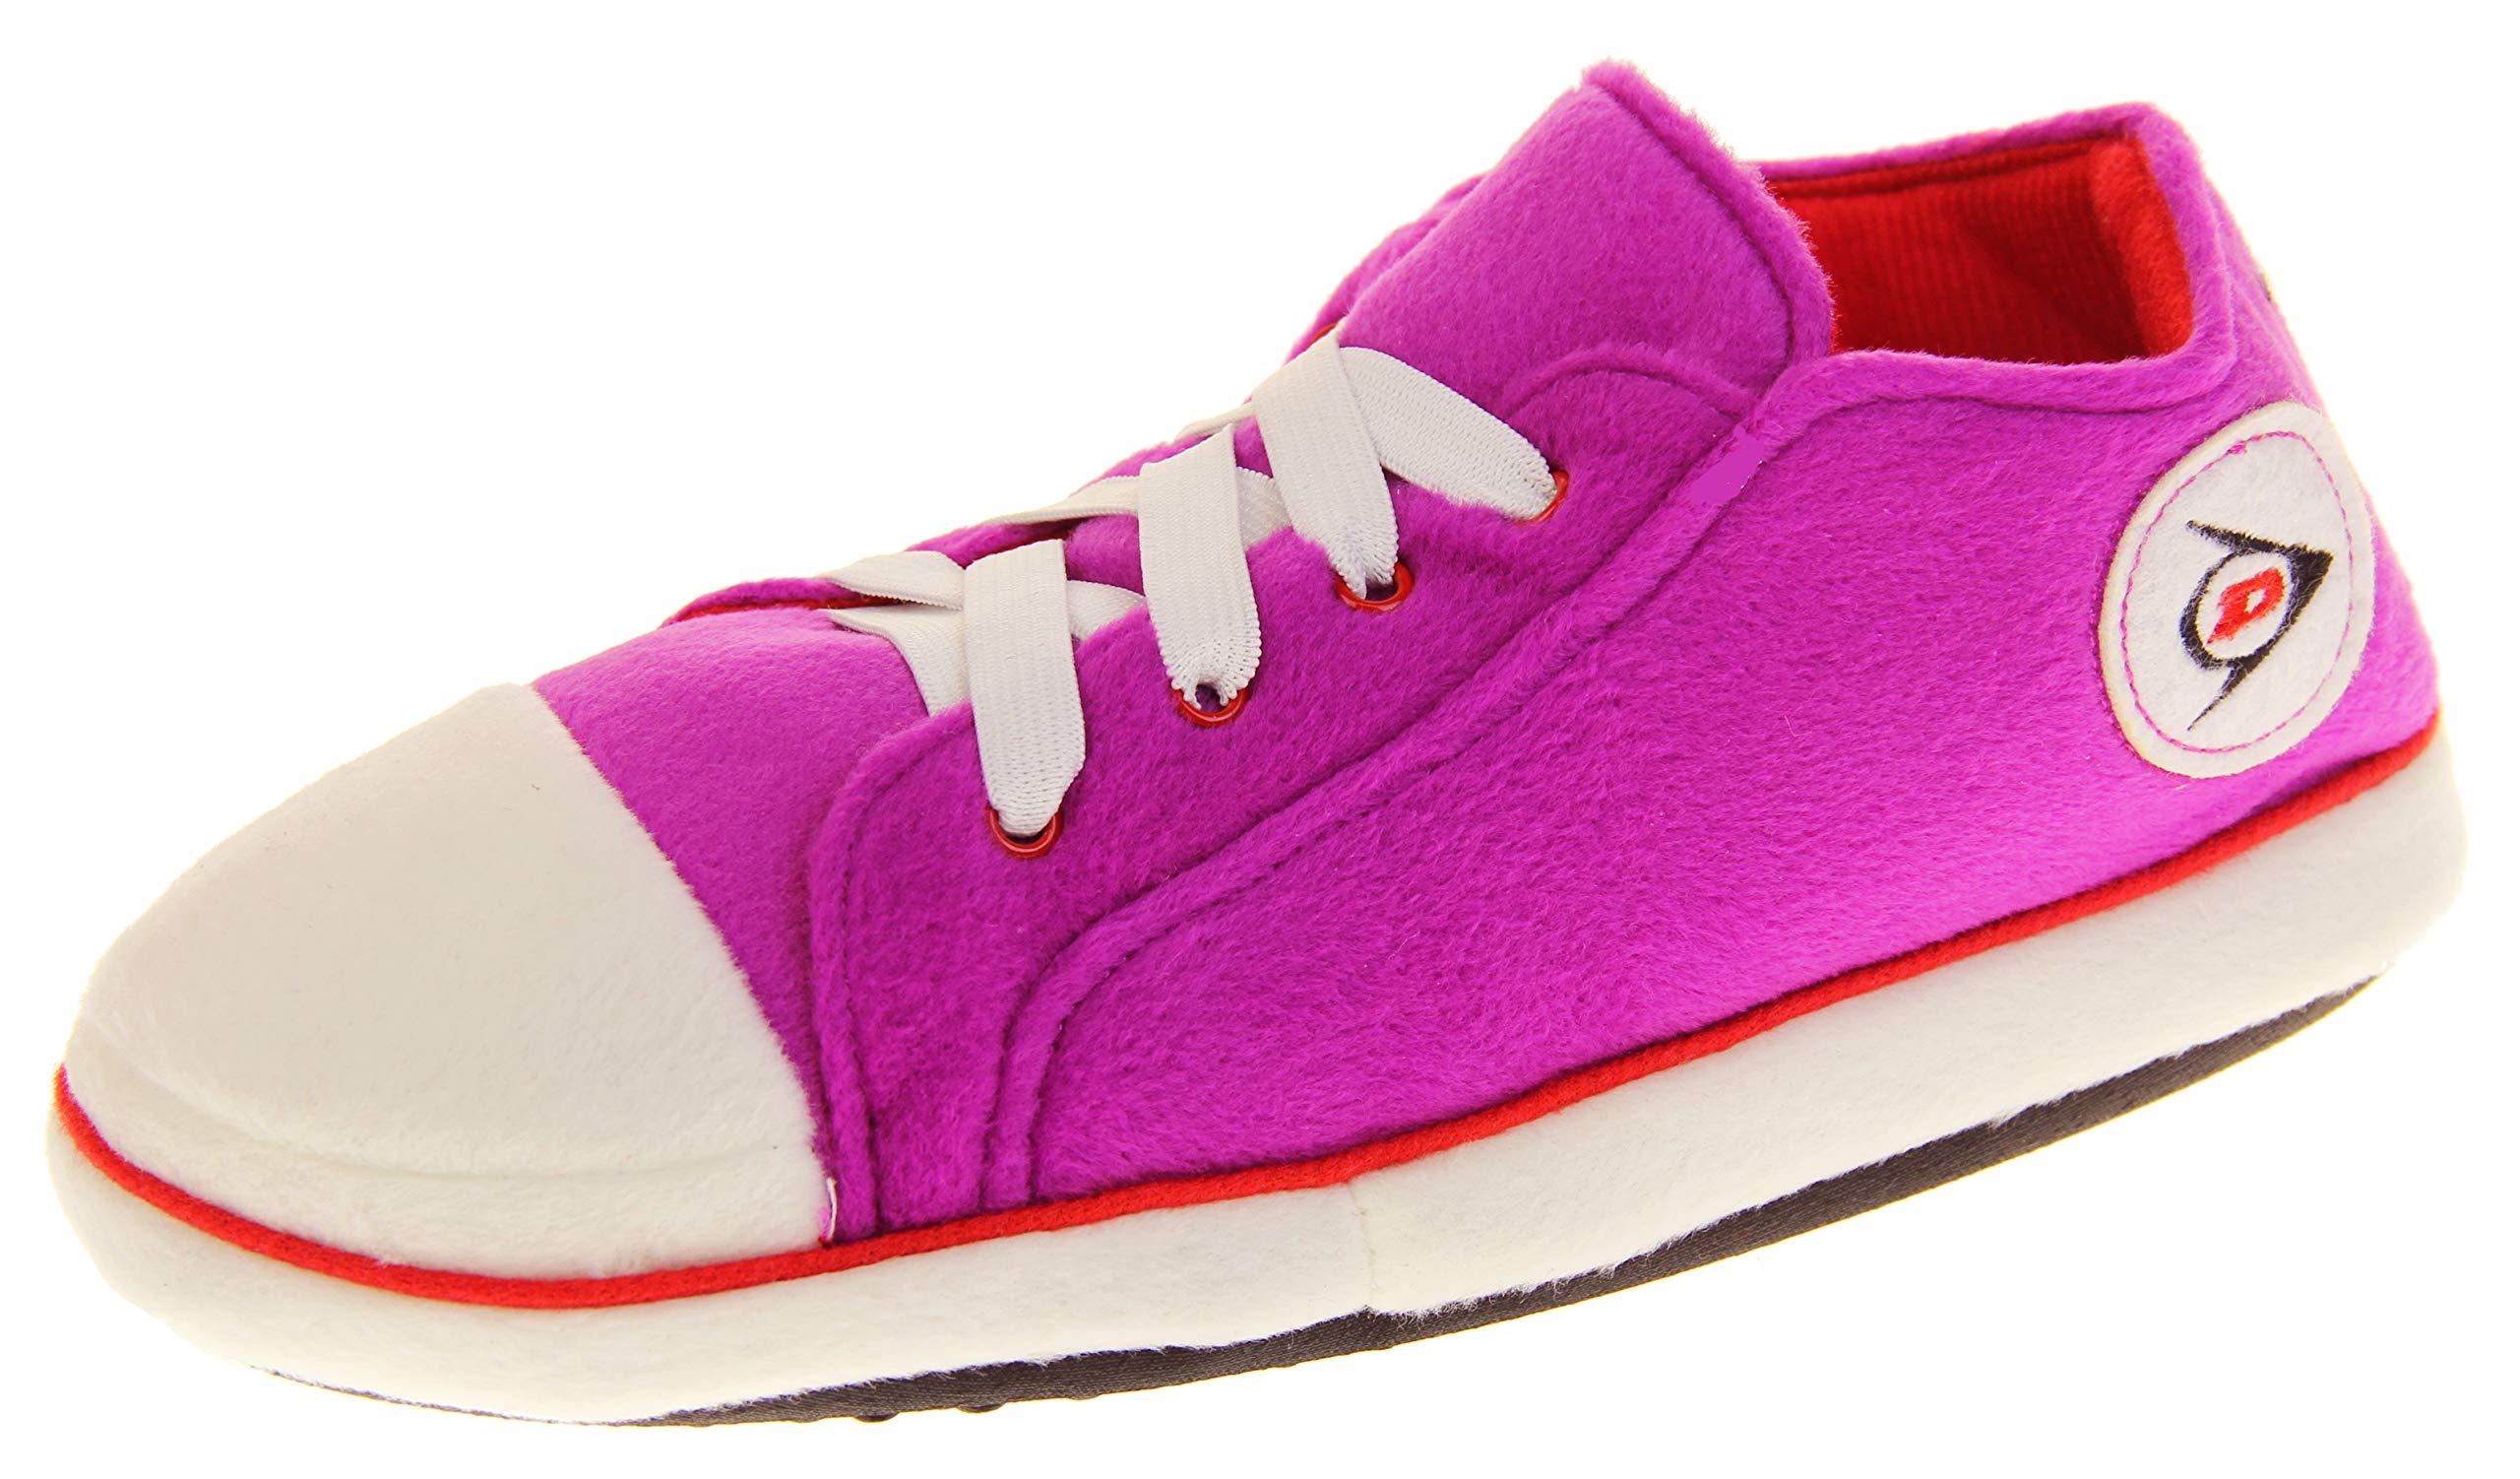 Dunlop Womens Hi Top Trainer Boot Shoe Slippers